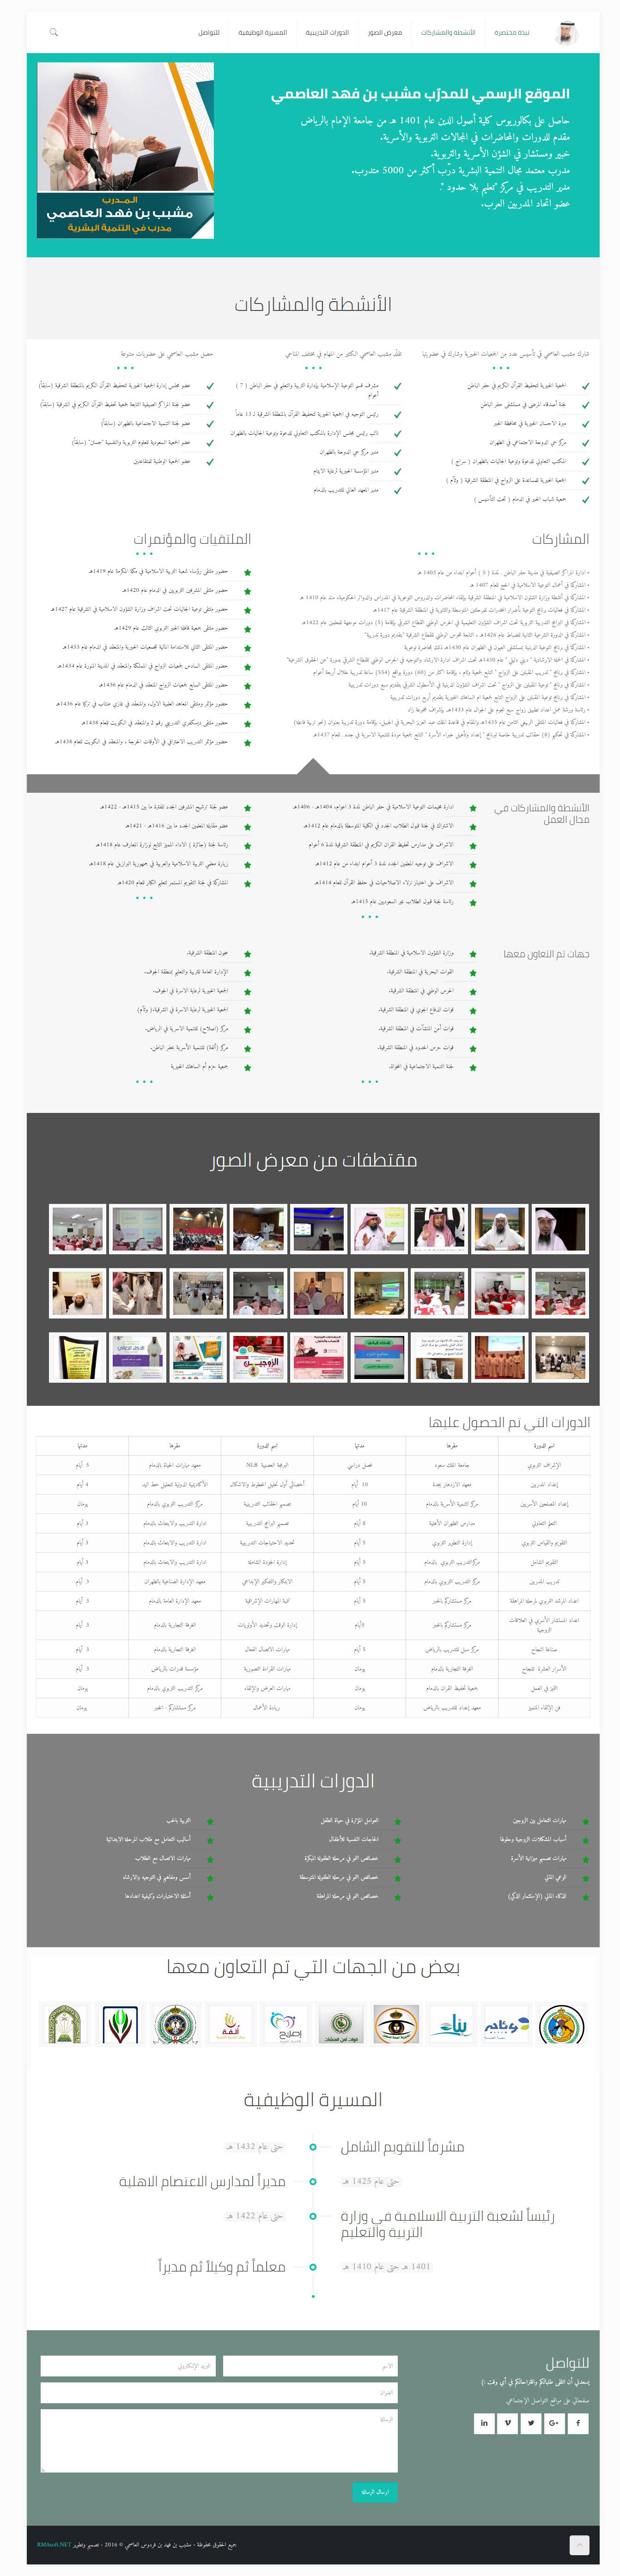 al-assmi-1479108301769